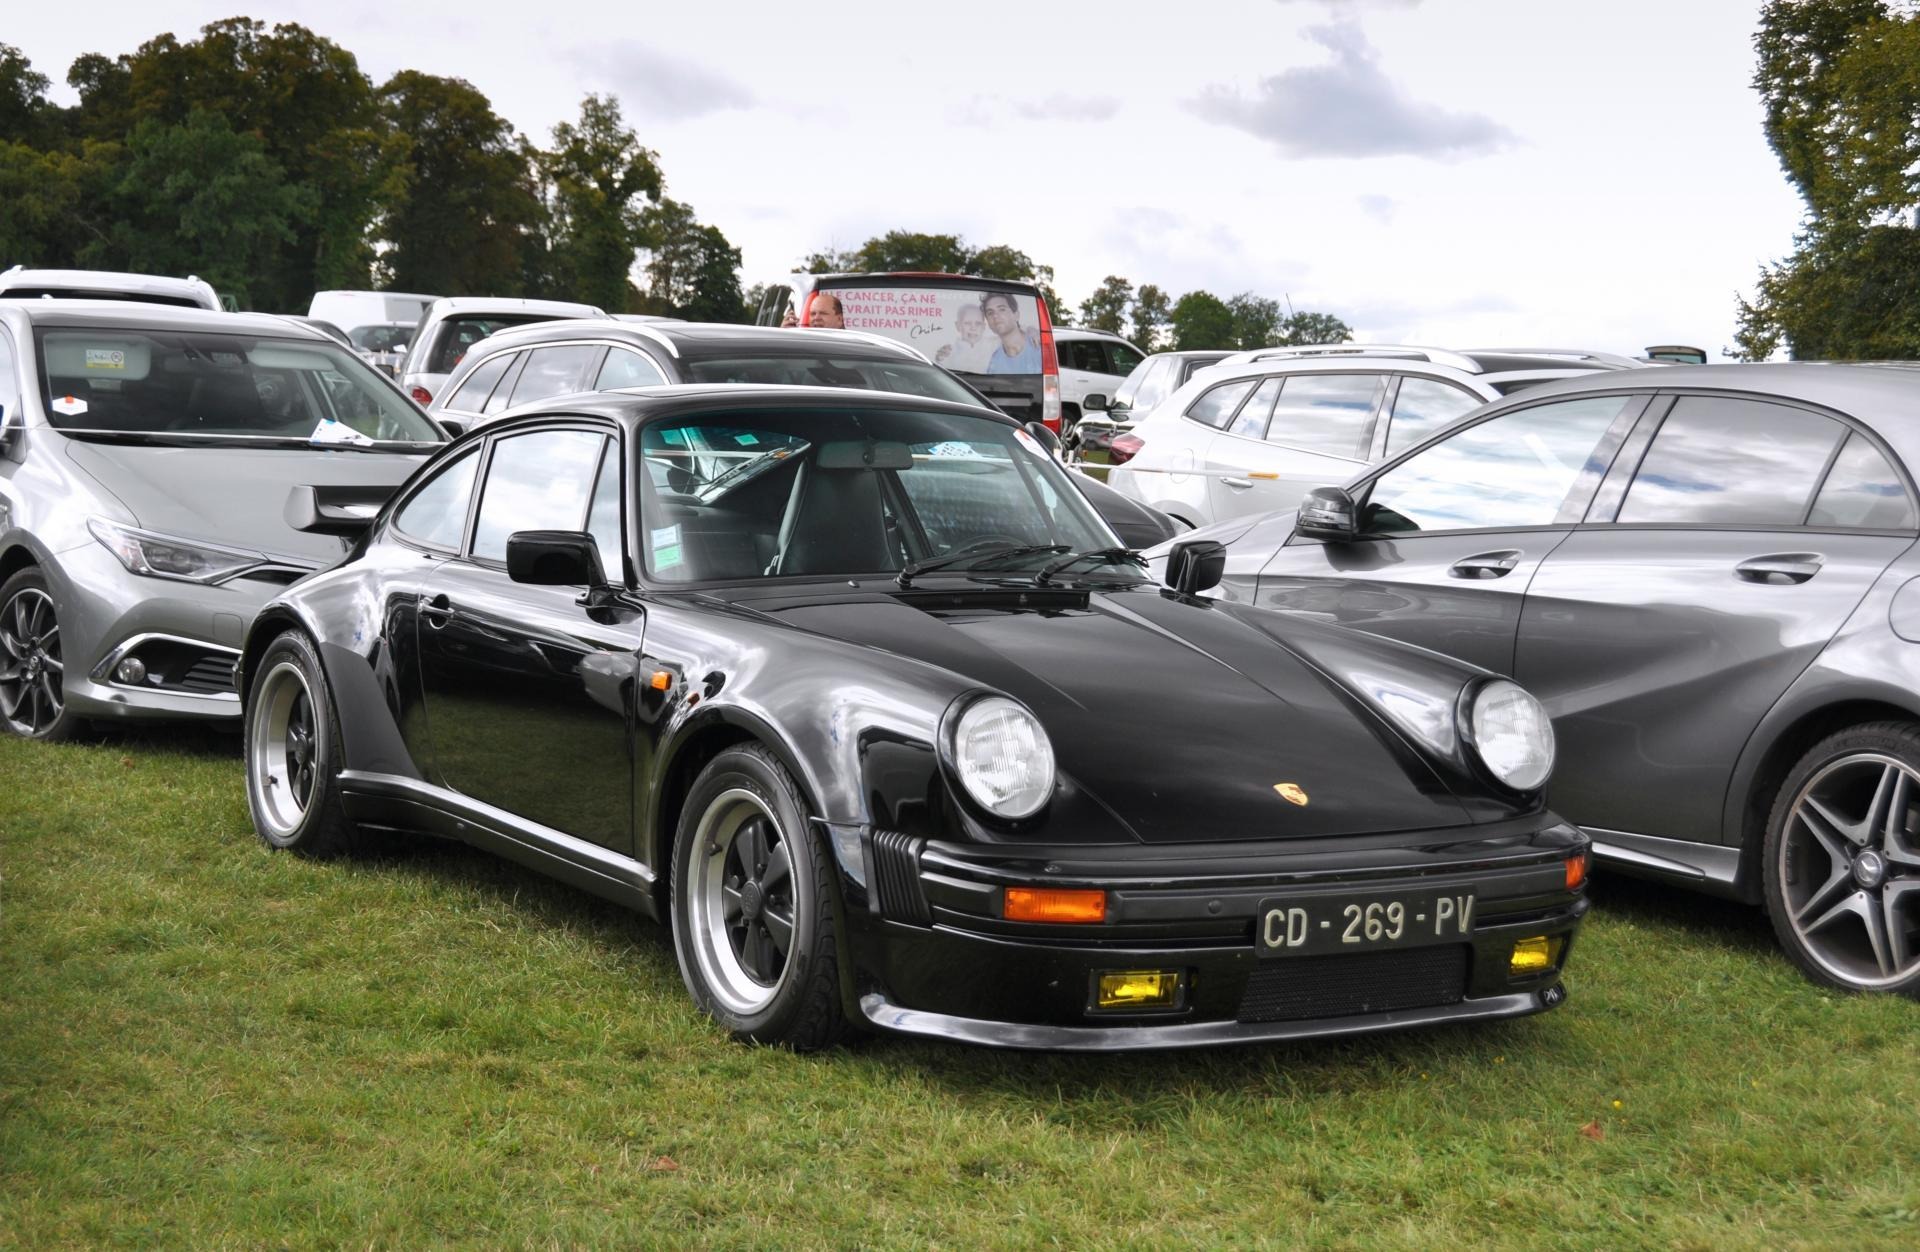 930 turbo s sonauto